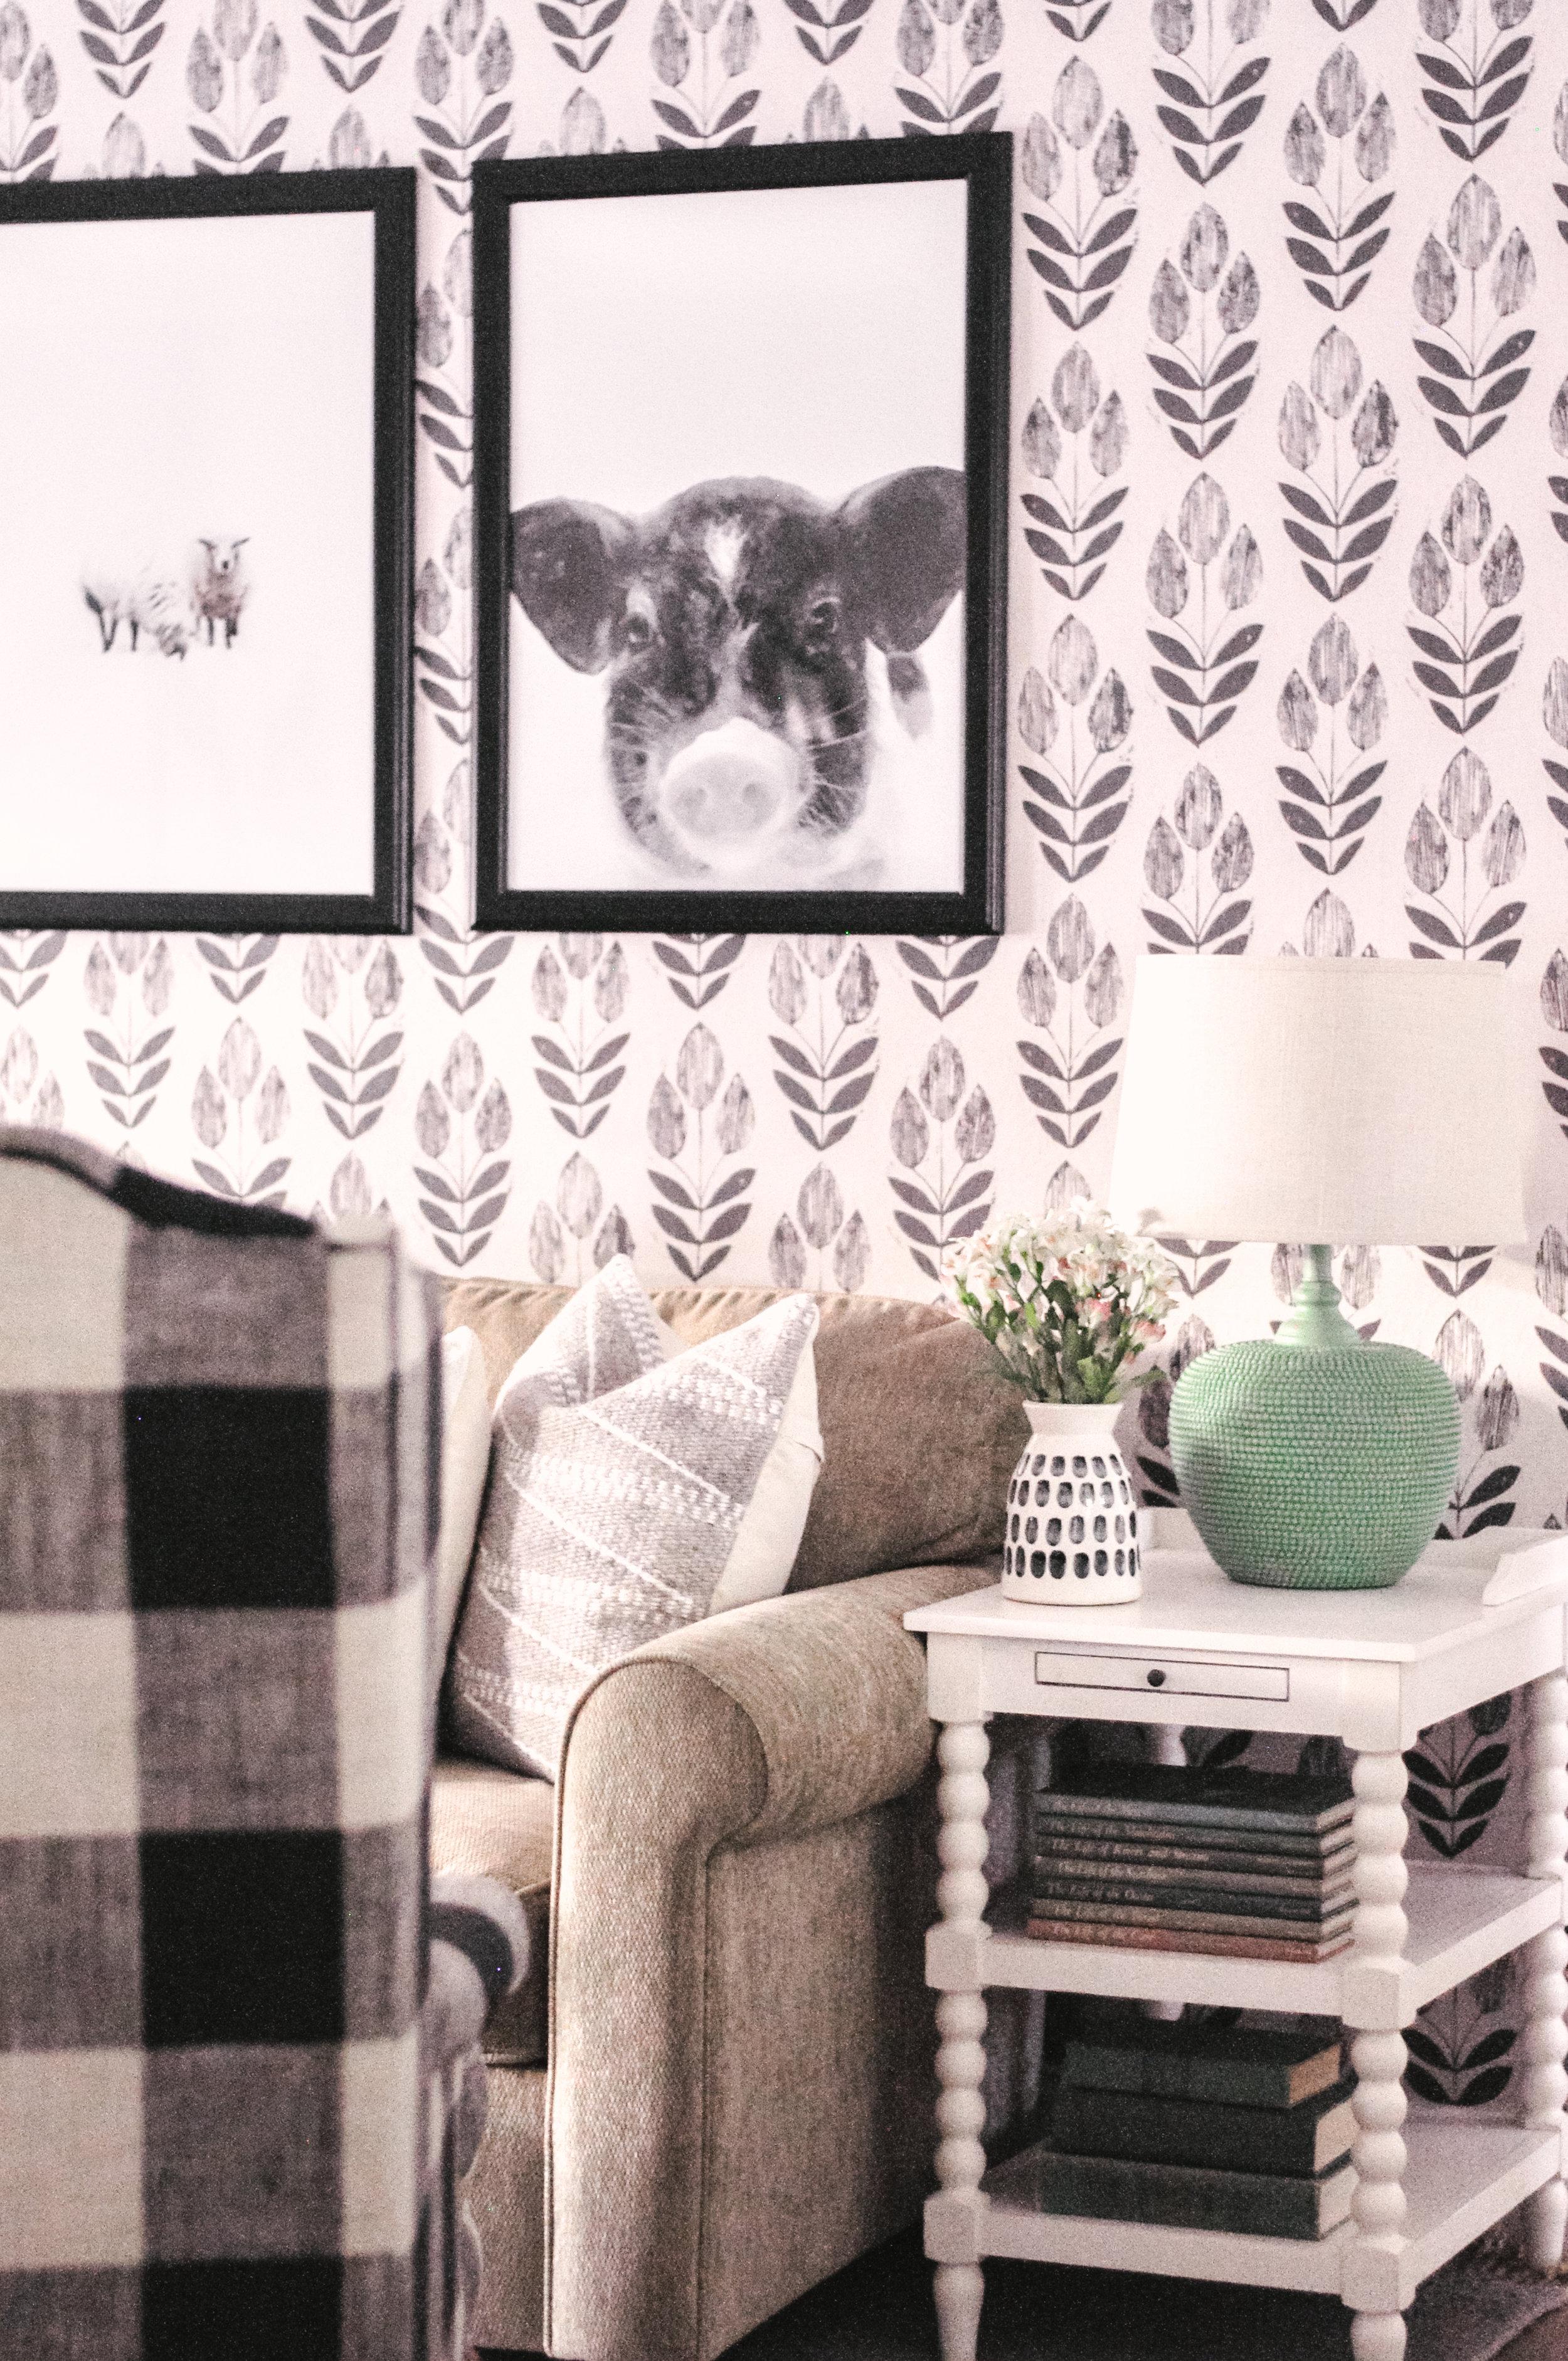 Scandinavian Block Print Tulip Wallpaper in Black and White